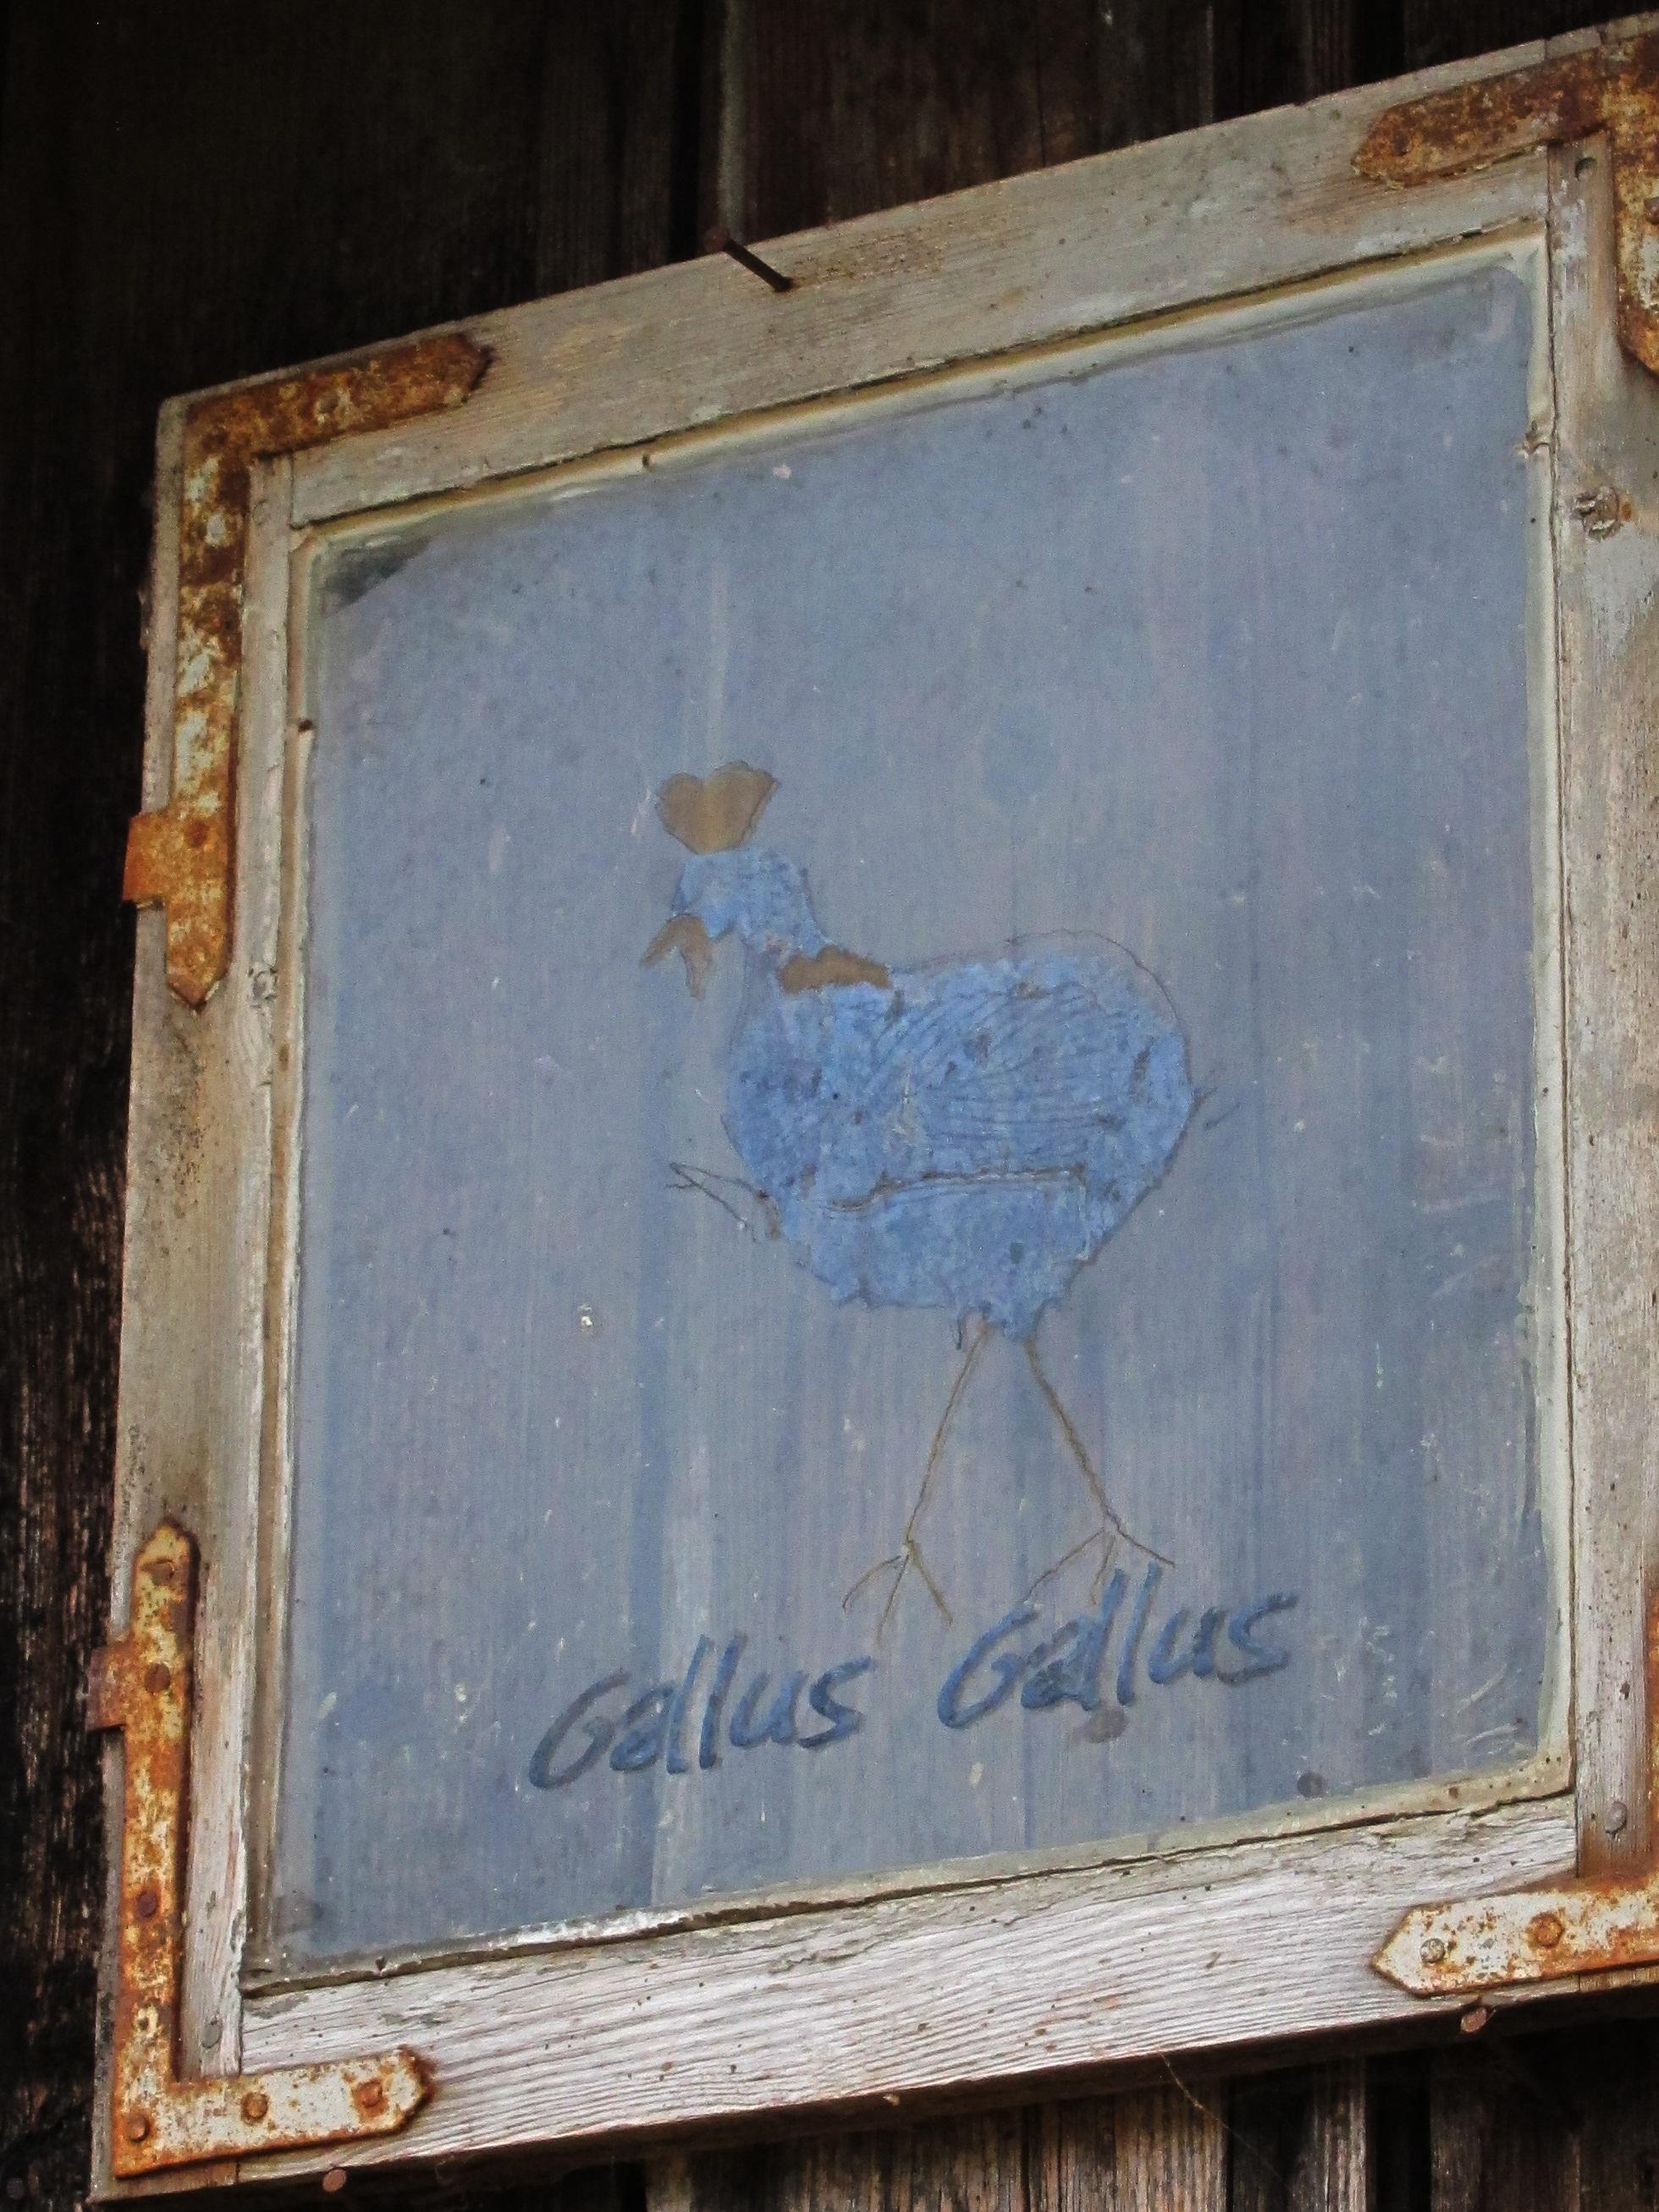 Hønsegård - Ingunn sin hønsegård fikk eget Gallus gallus-vindu, selvsagt! Nå pryder det uthusveggen.